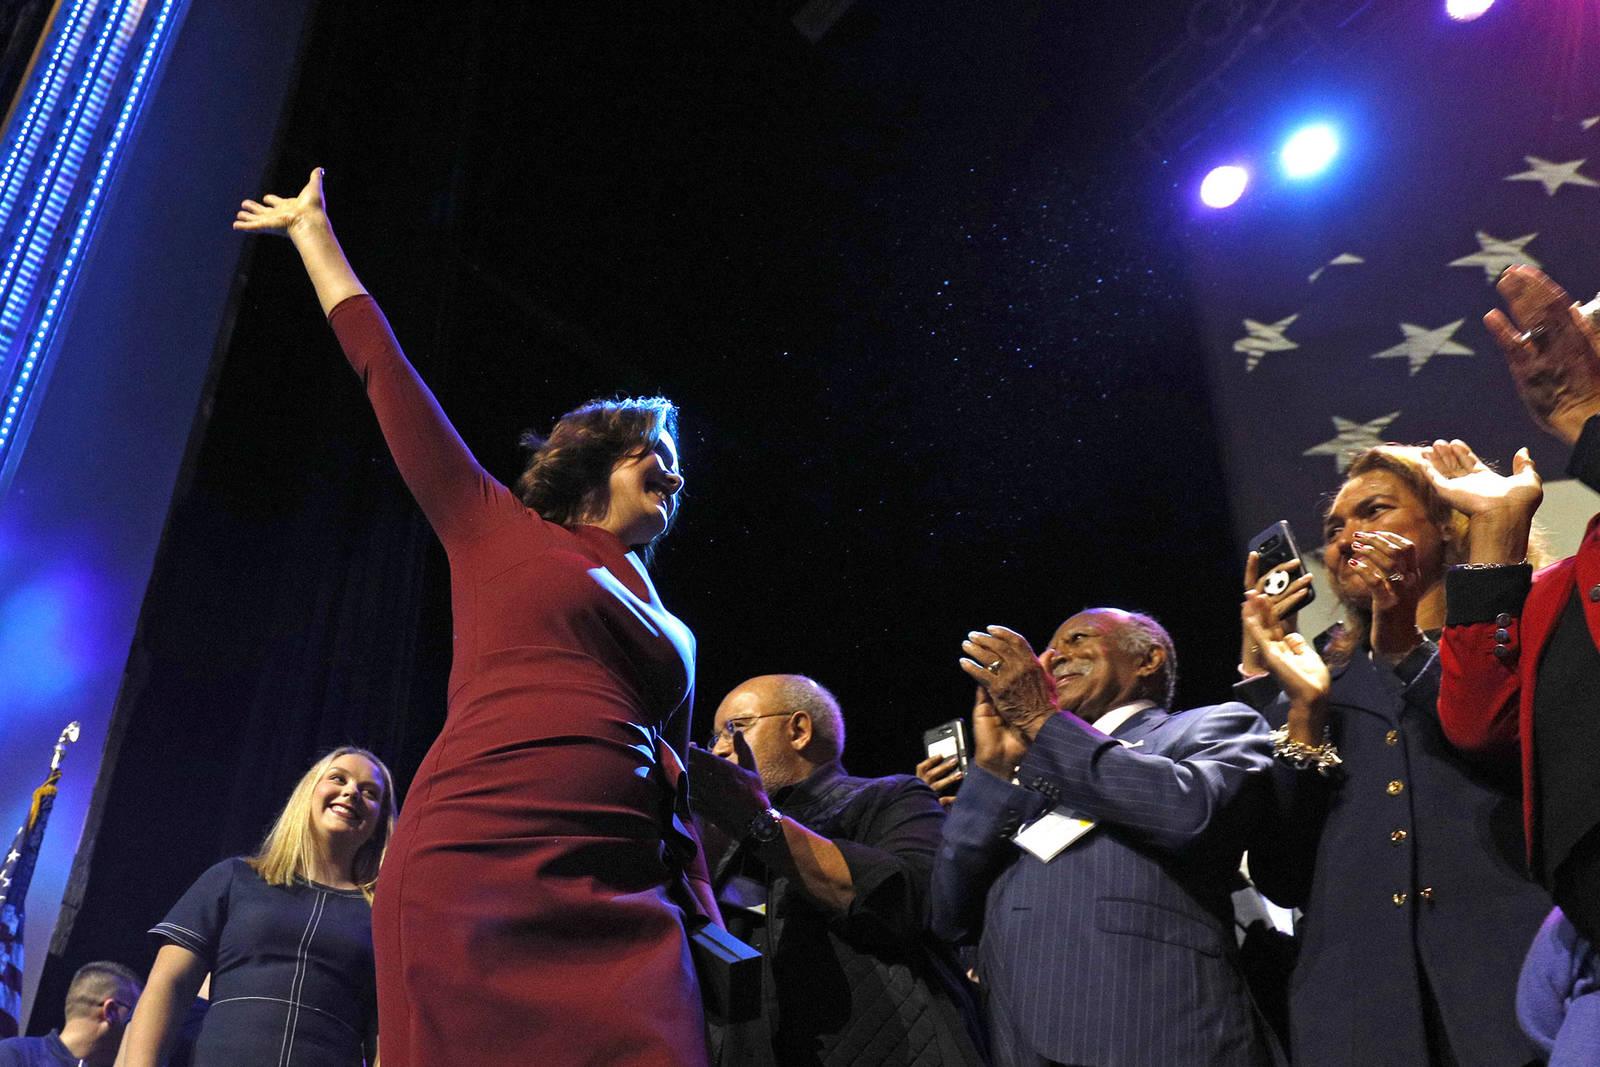 Michigan Governor-elect Gretchen Whitmer, a Democrat, supports clean energy. Credit: Bill Pugliano/Getty Images